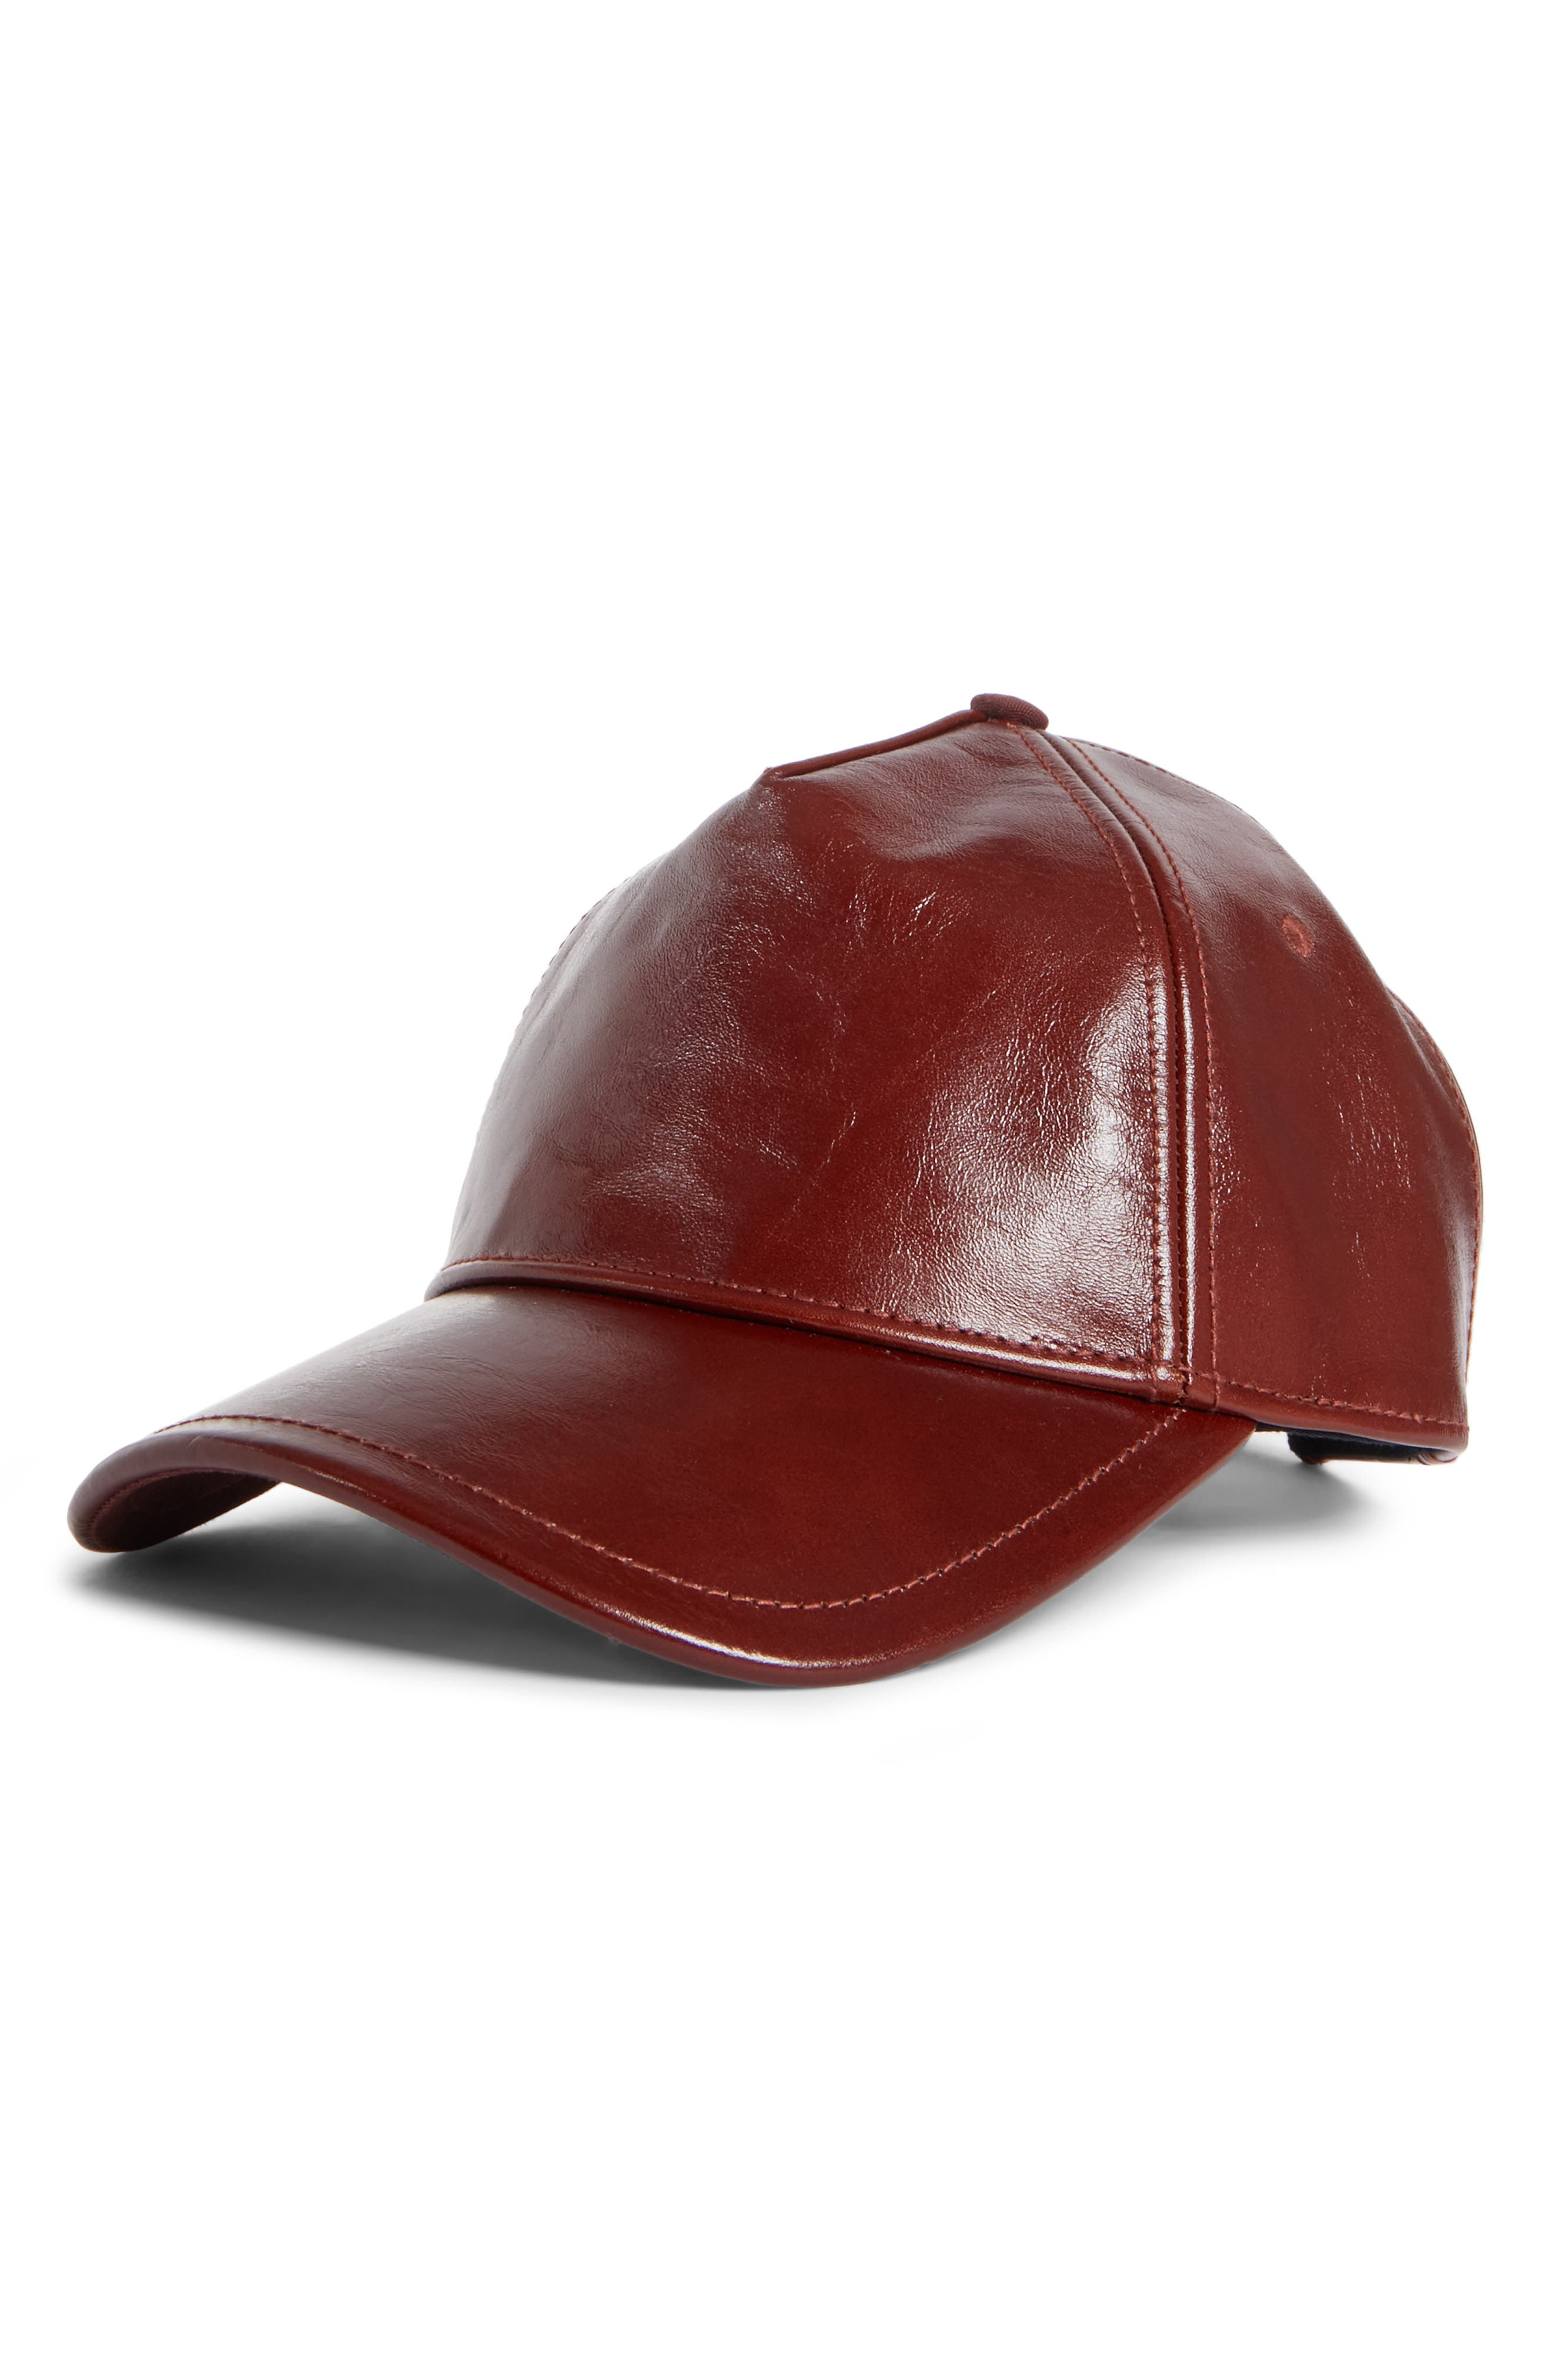 Marilyn Leather Baseball Cap - Brown in Dark Brown